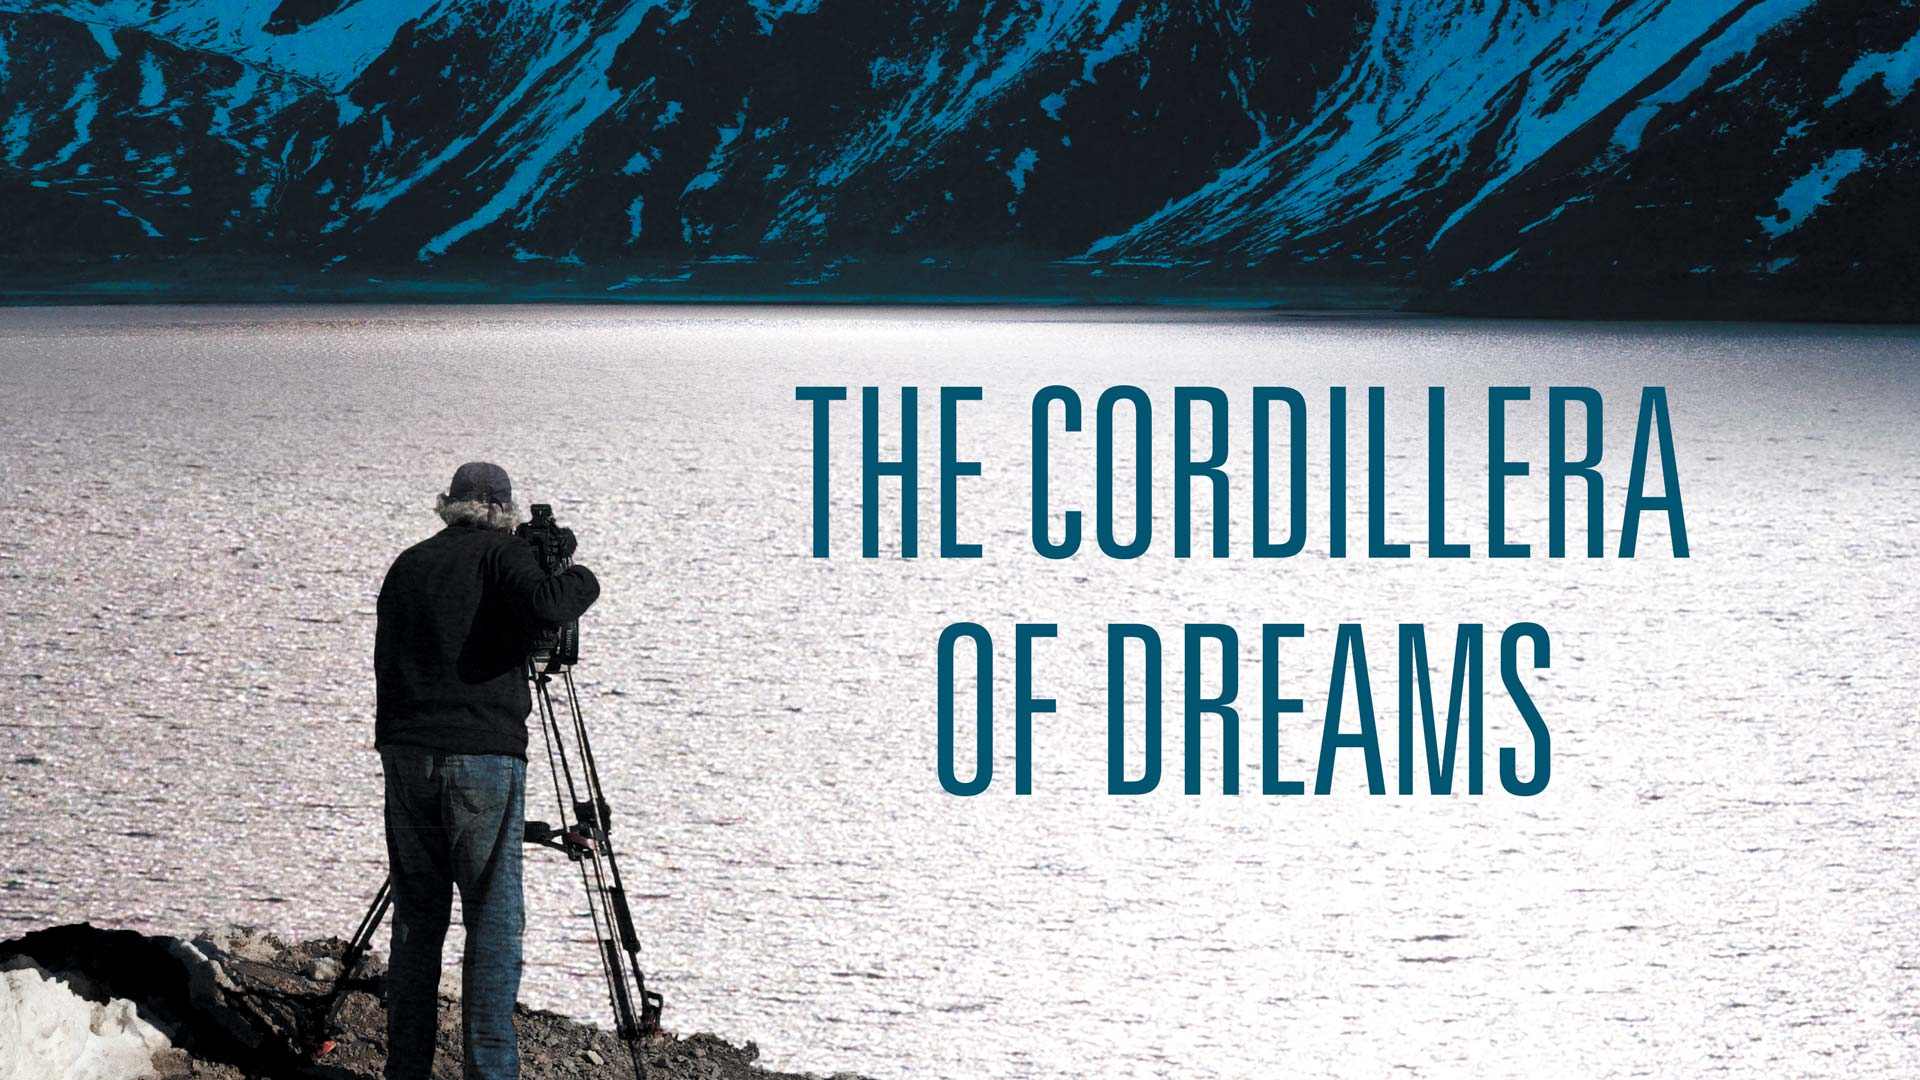 The Cordillera of Dreams - image